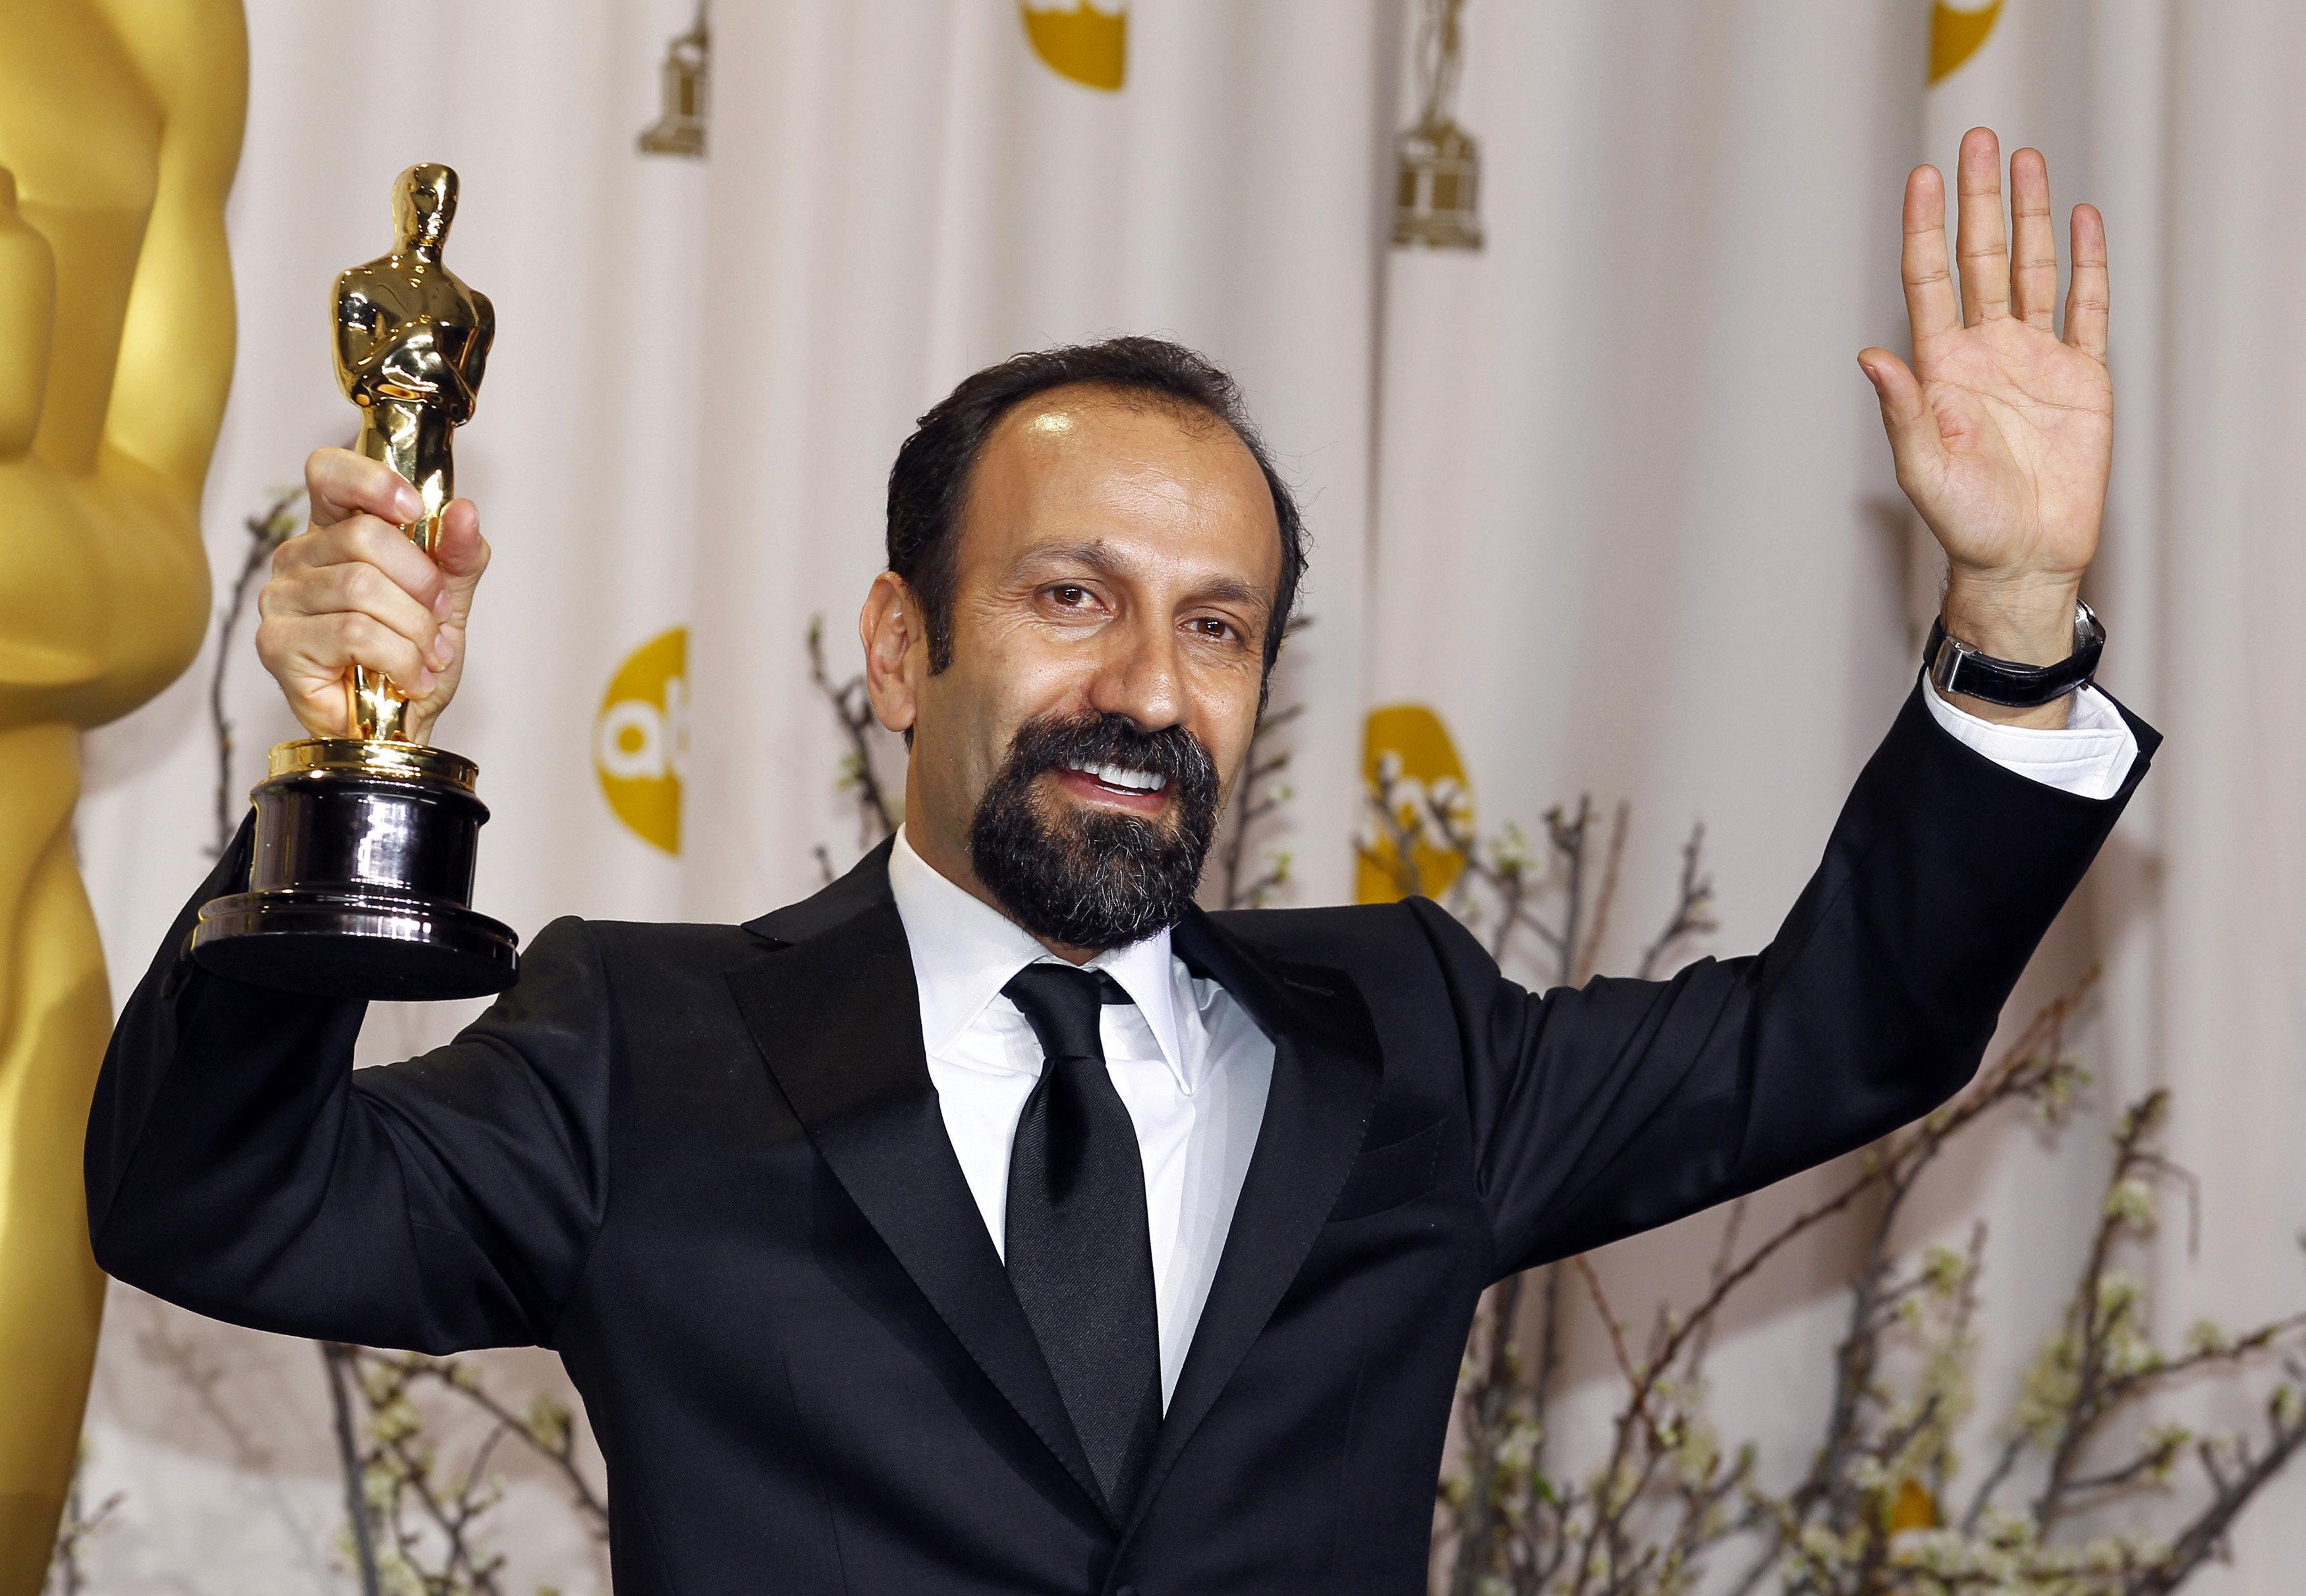 Iranian Director Wins Big After Boycotting Oscars Over Trump's Muslim